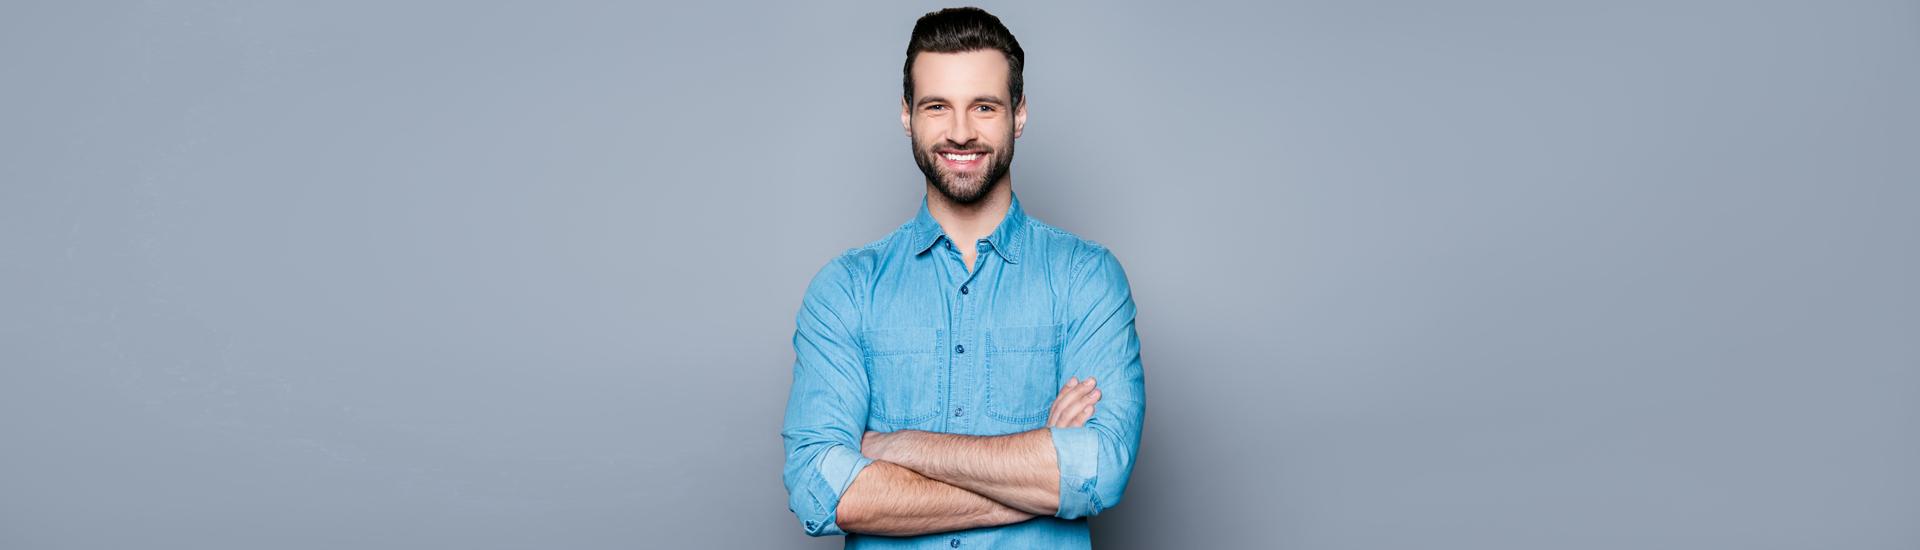 3 Teeth Whitening Procedures That Work